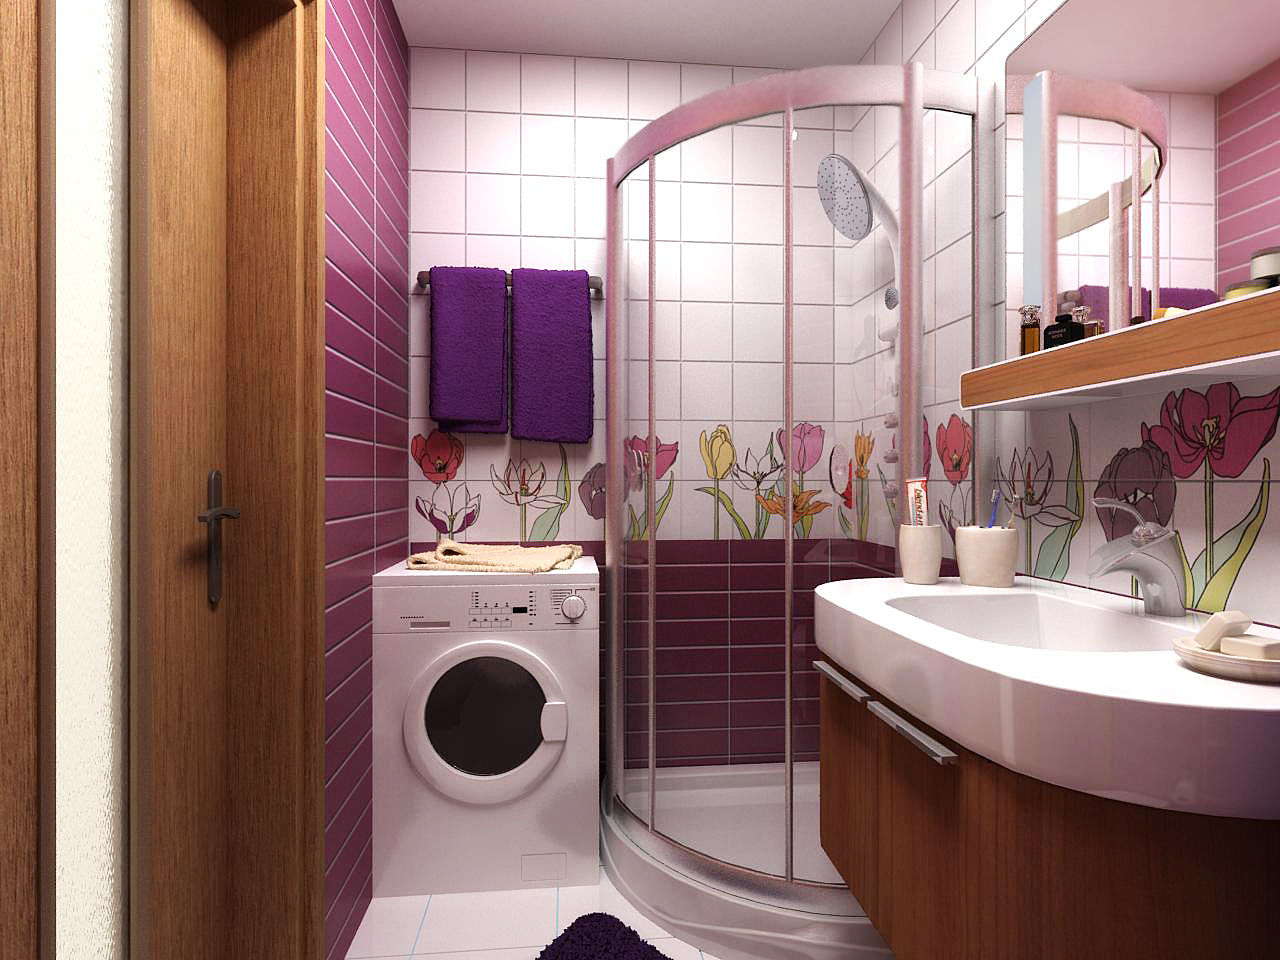 Ванная комната без протечек